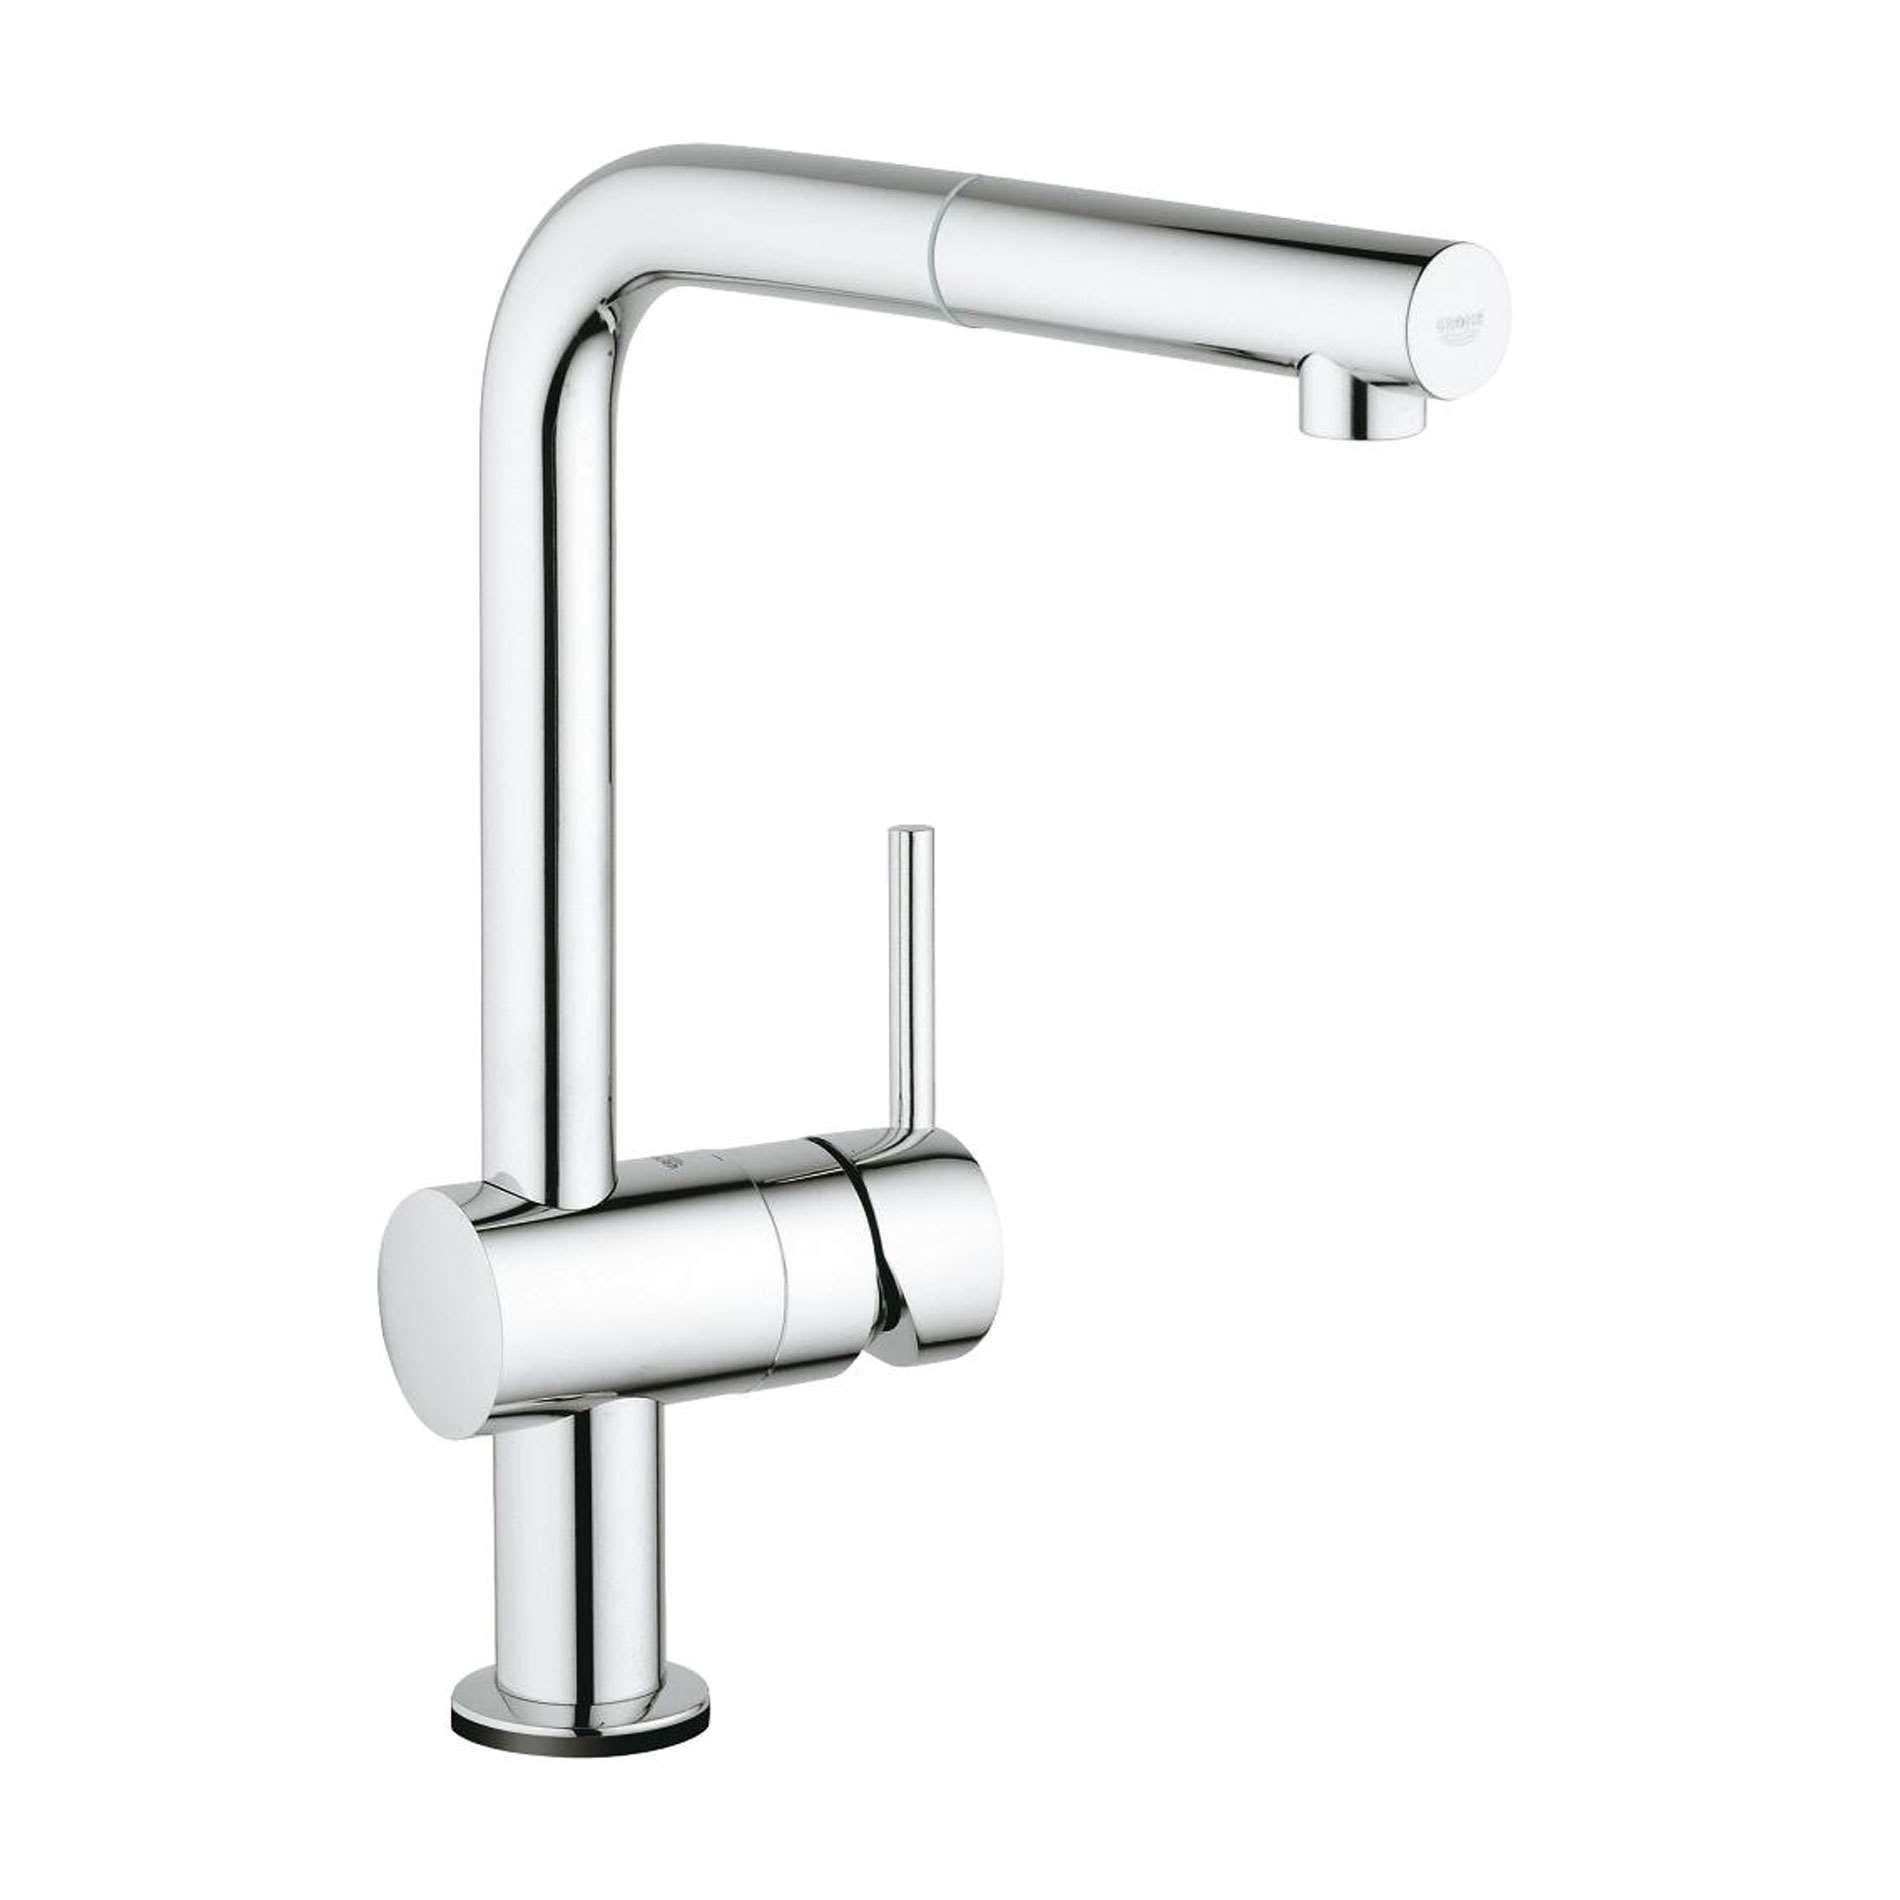 Grohe Minta Touch 31360001 Chrome Tap Kitchen Sinks Taps